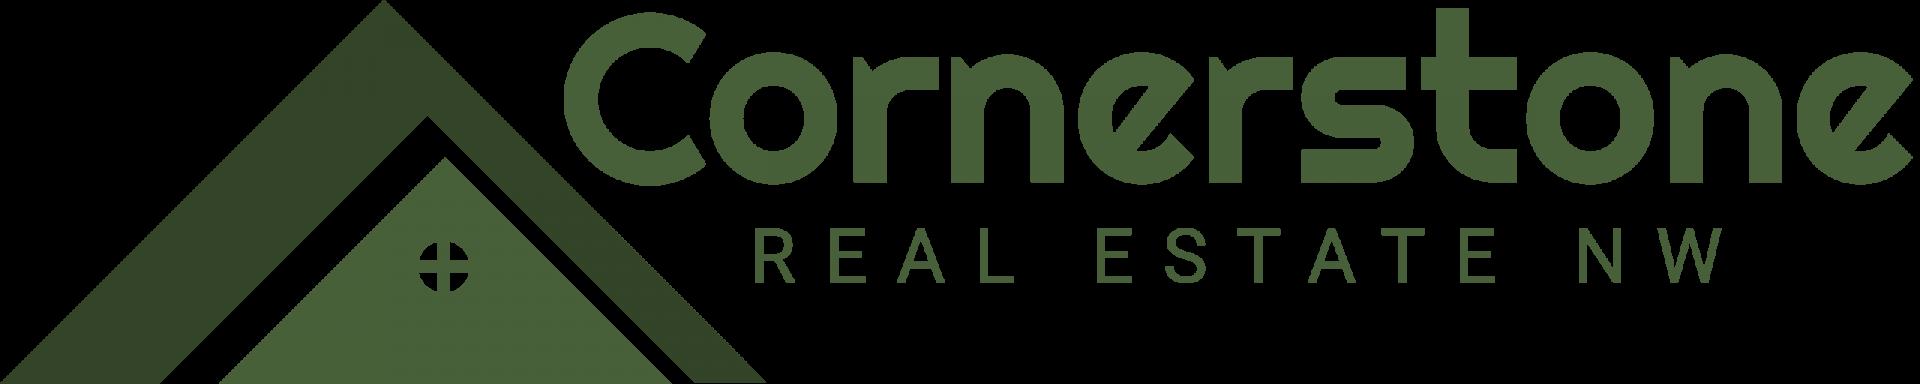 Cornerstone Real Estate NW logo